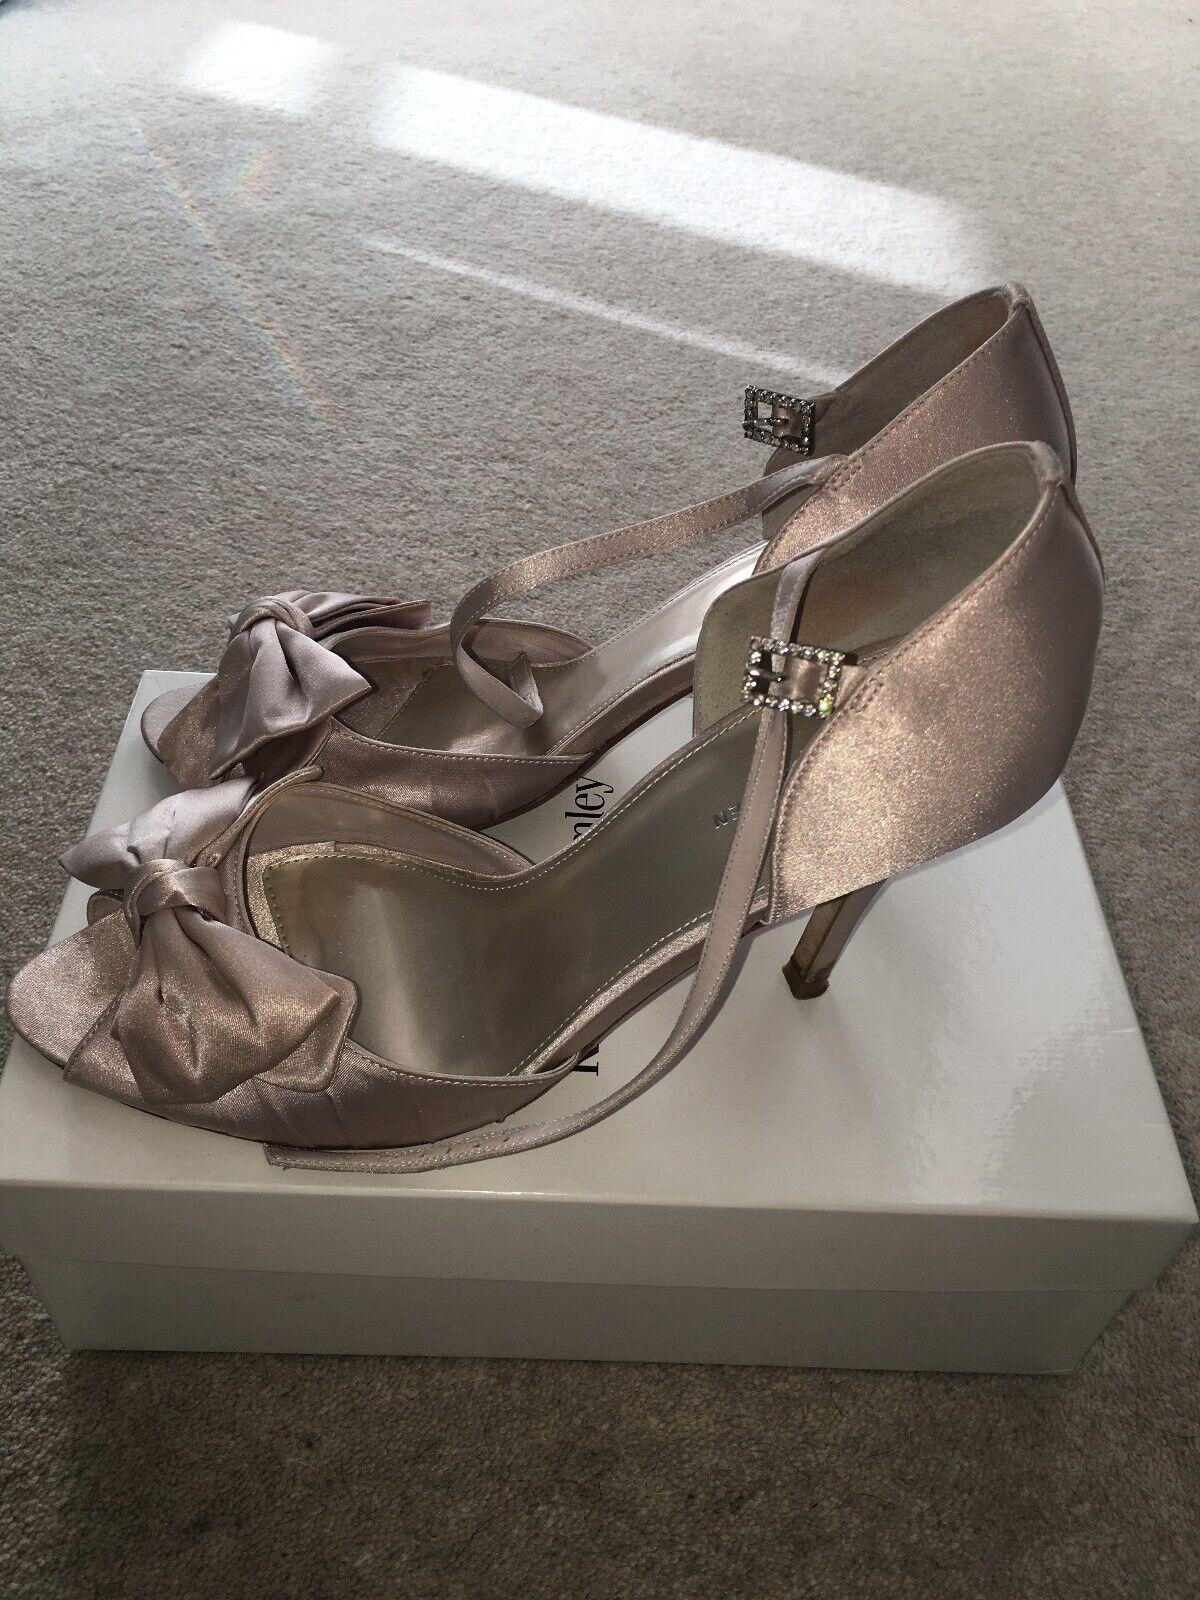 Karen Millen Heels silver   beige Size 40 Size SIZE 7